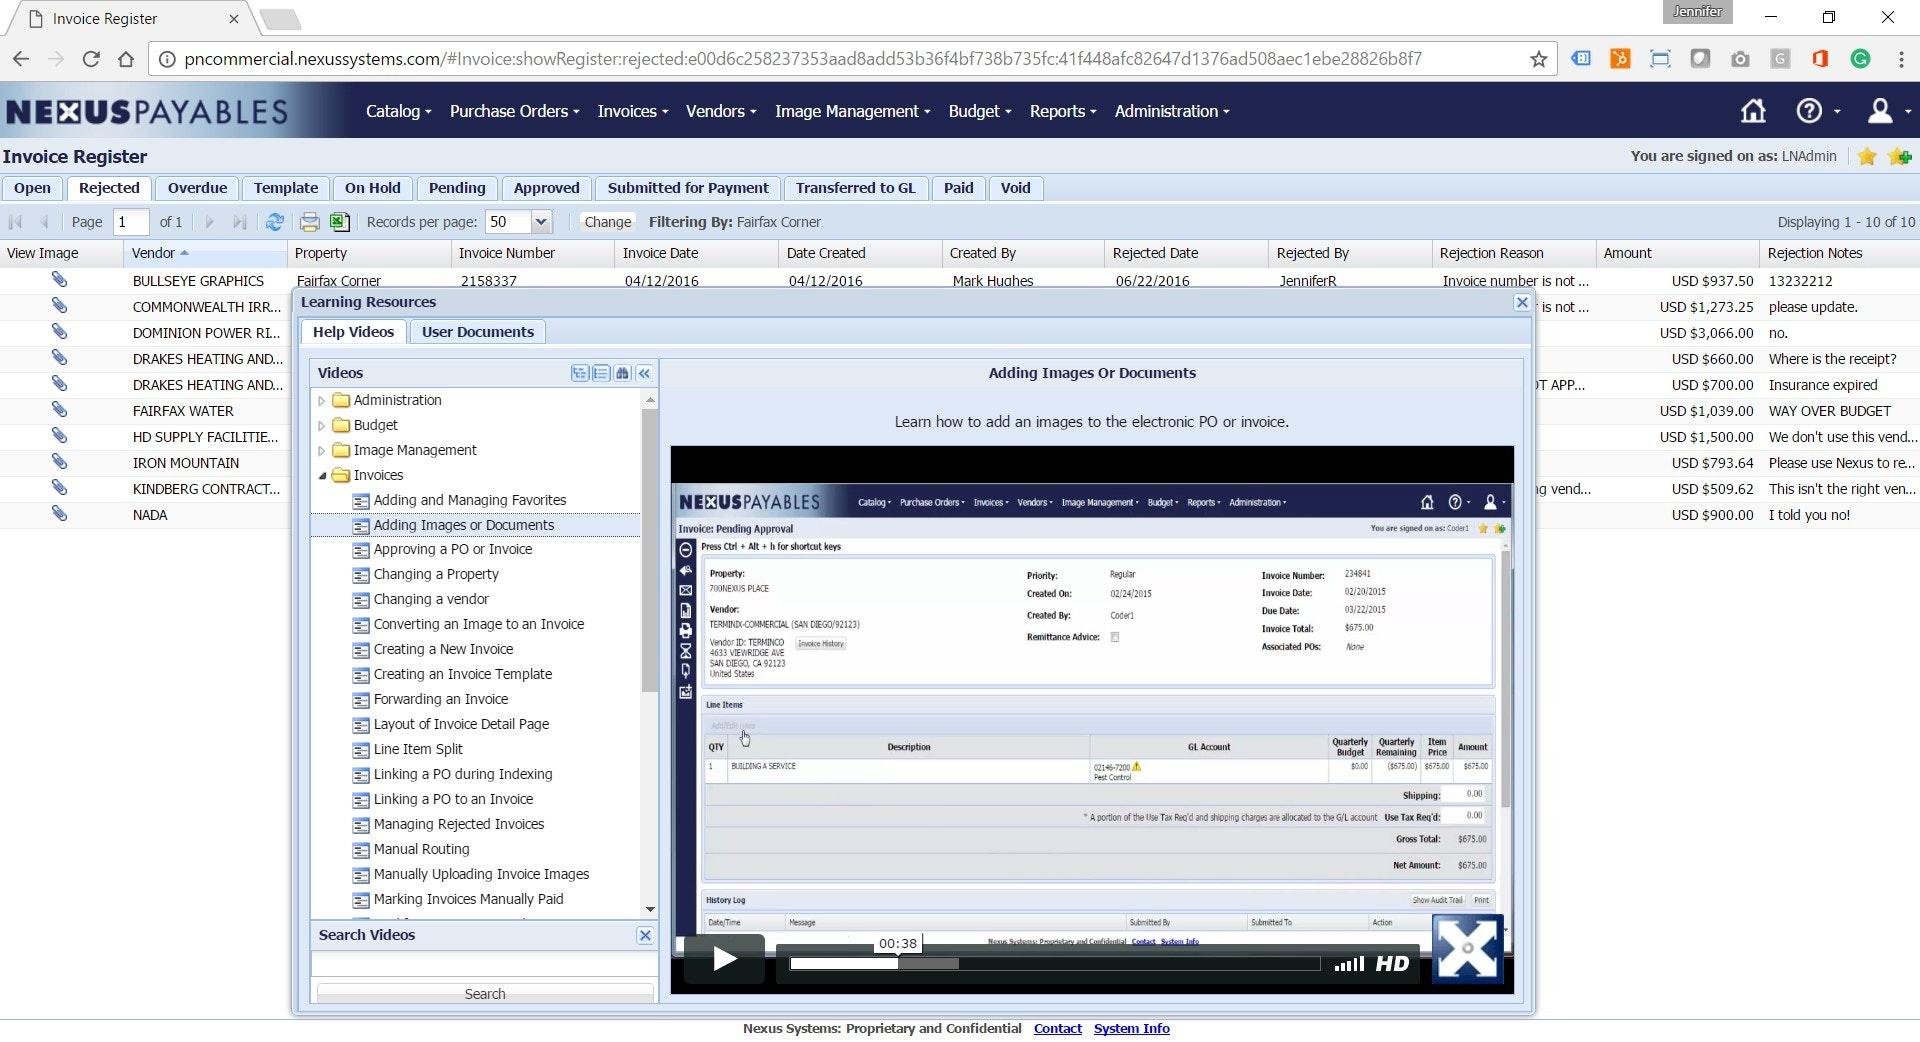 Embedded user training